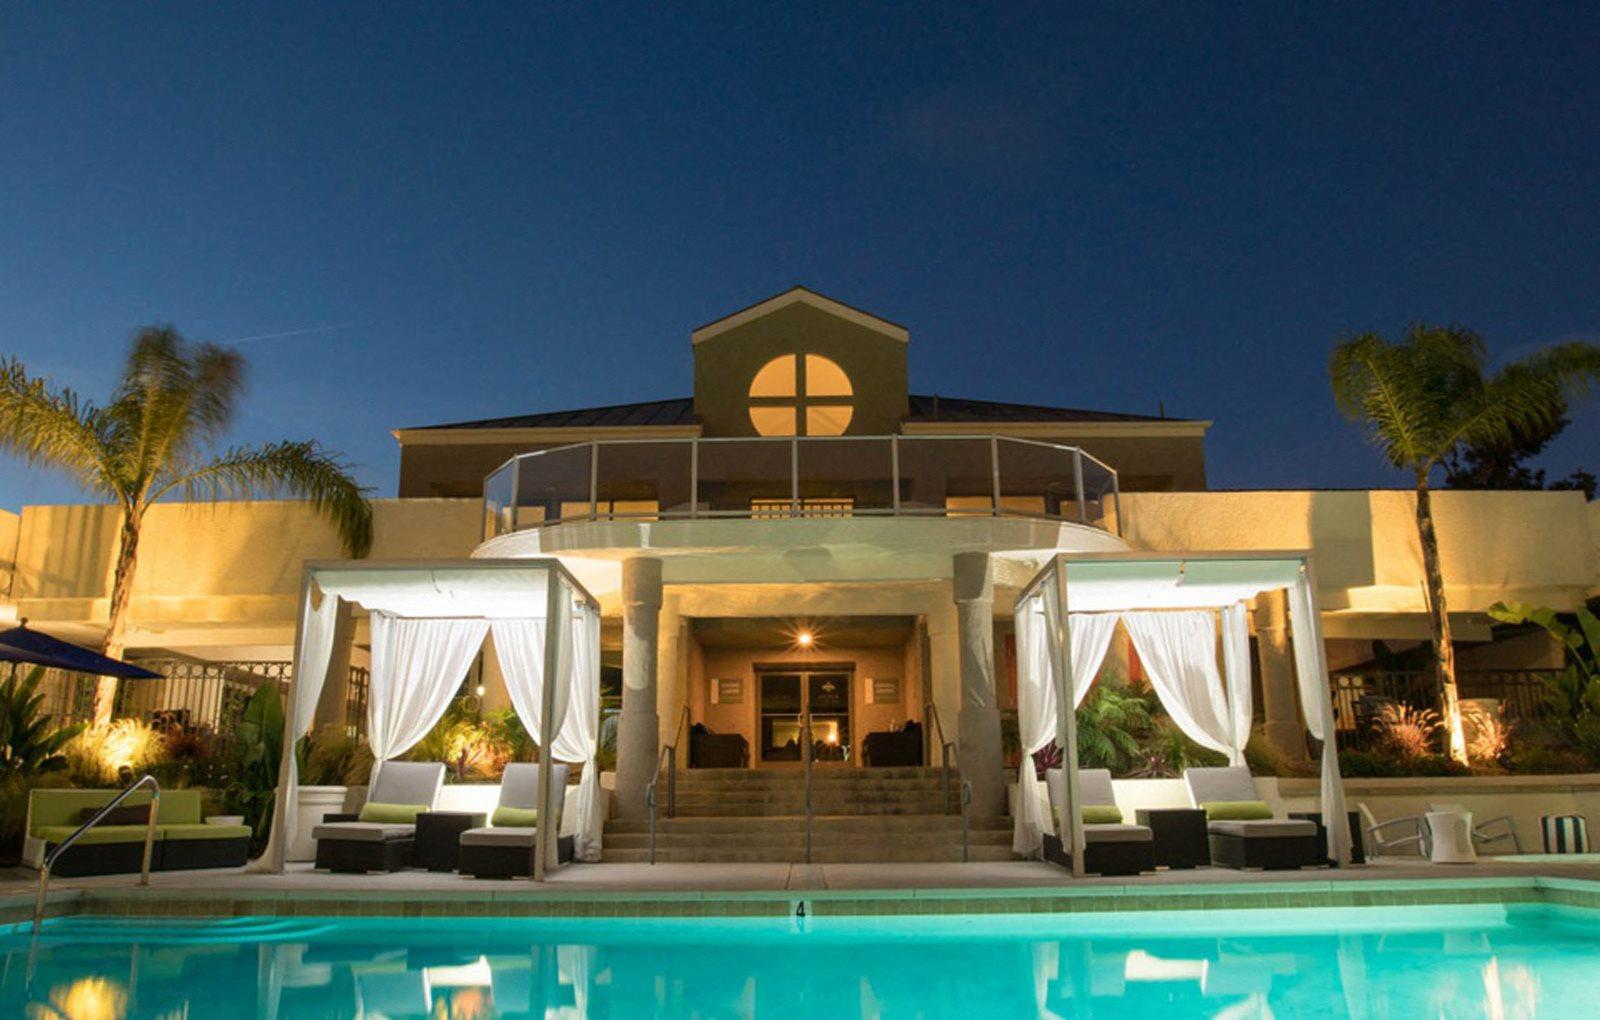 Night time pool with cabanas